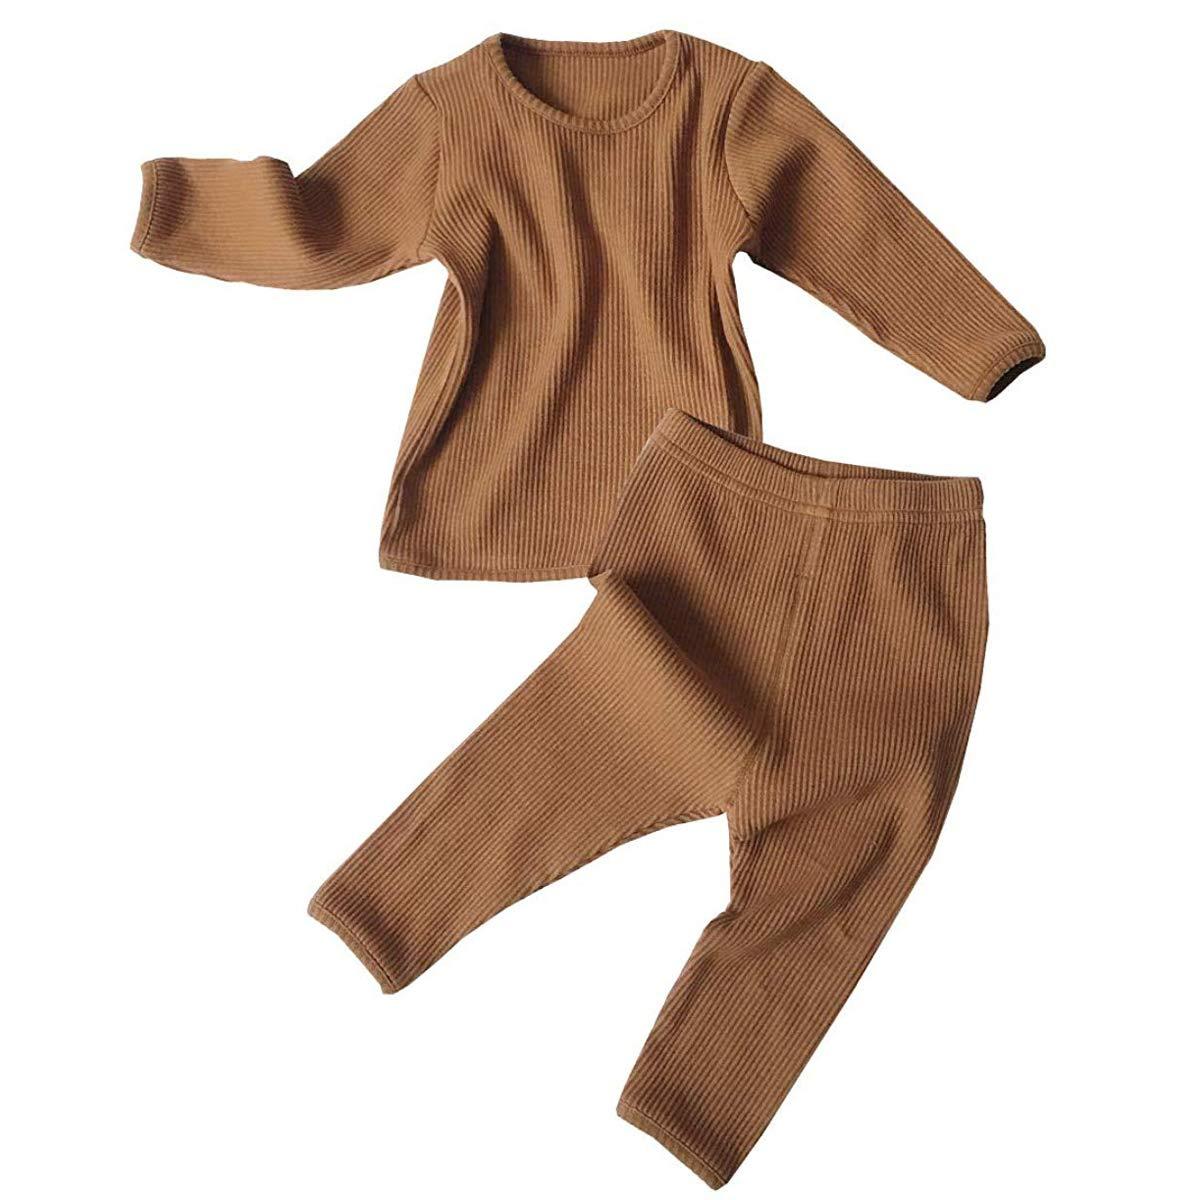 Newborn Boy Girl Solid Colors Clothes Pants Set Baby Kids Long Sleeve Tops Sweatsuit Set Sleepwear